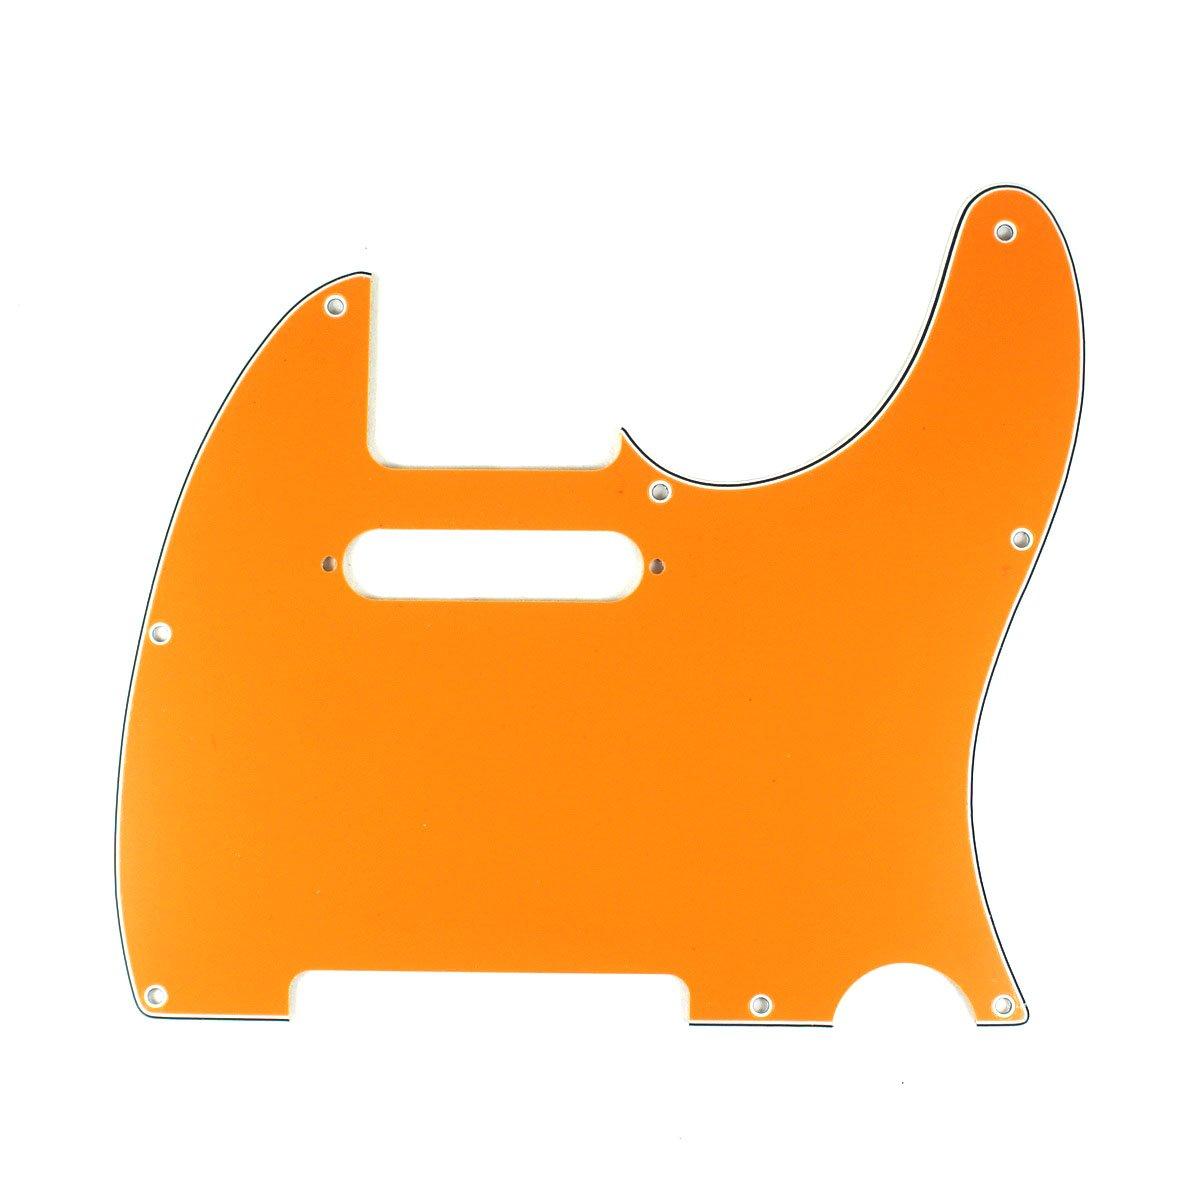 B07 3 Ply Guitar Pickguard Fits Telecaster Tele Standard 8 Hole ORANGE